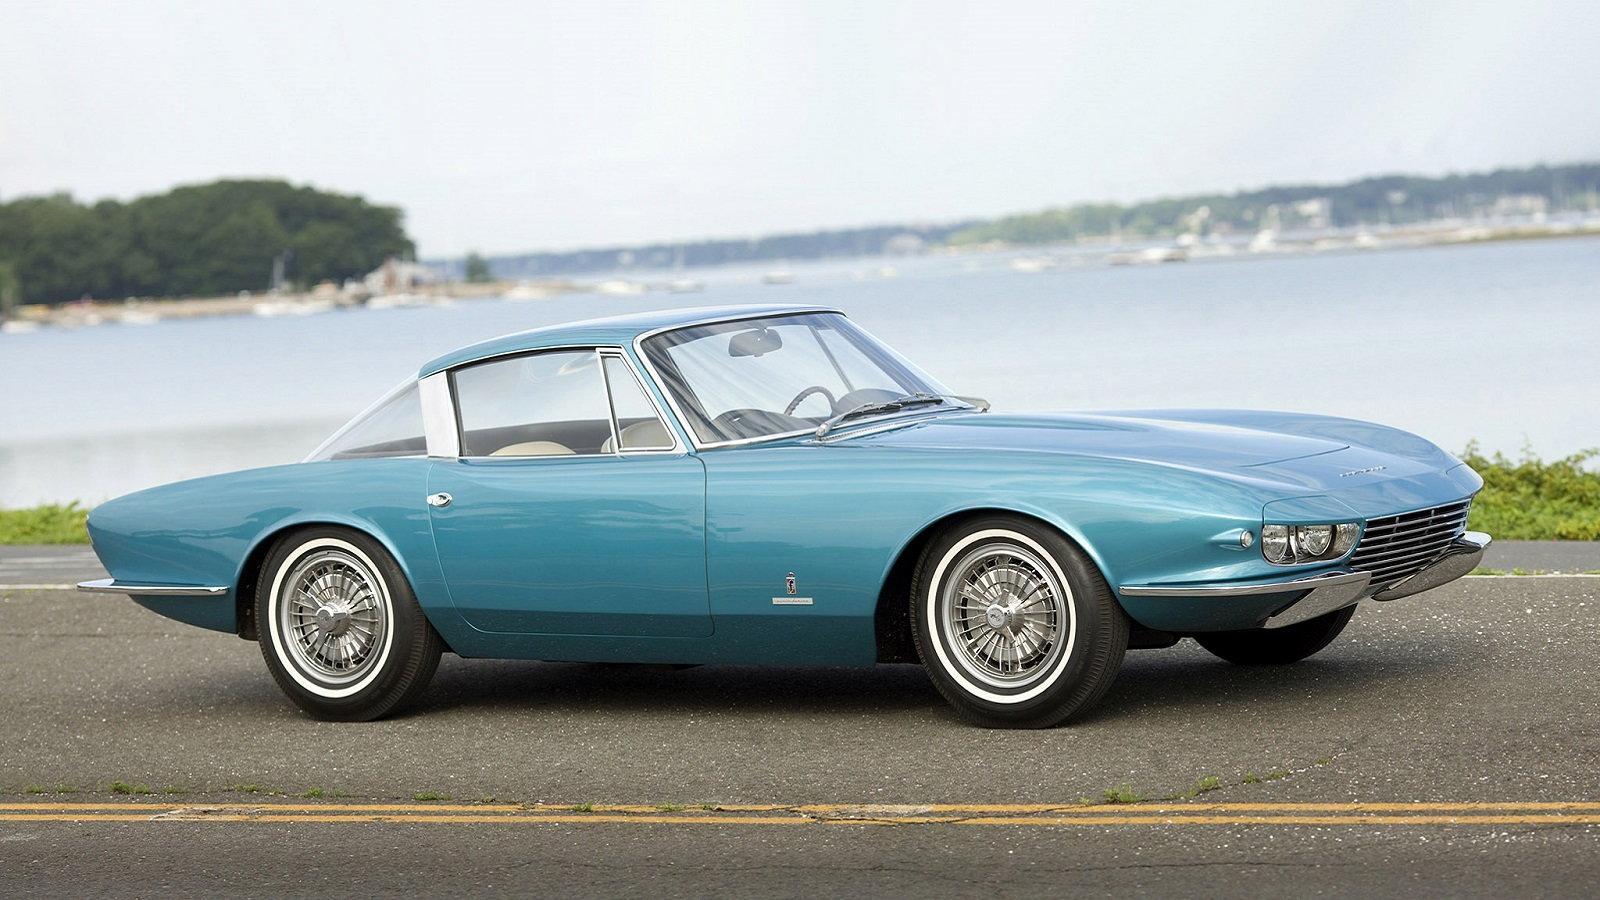 The Italian Corvette